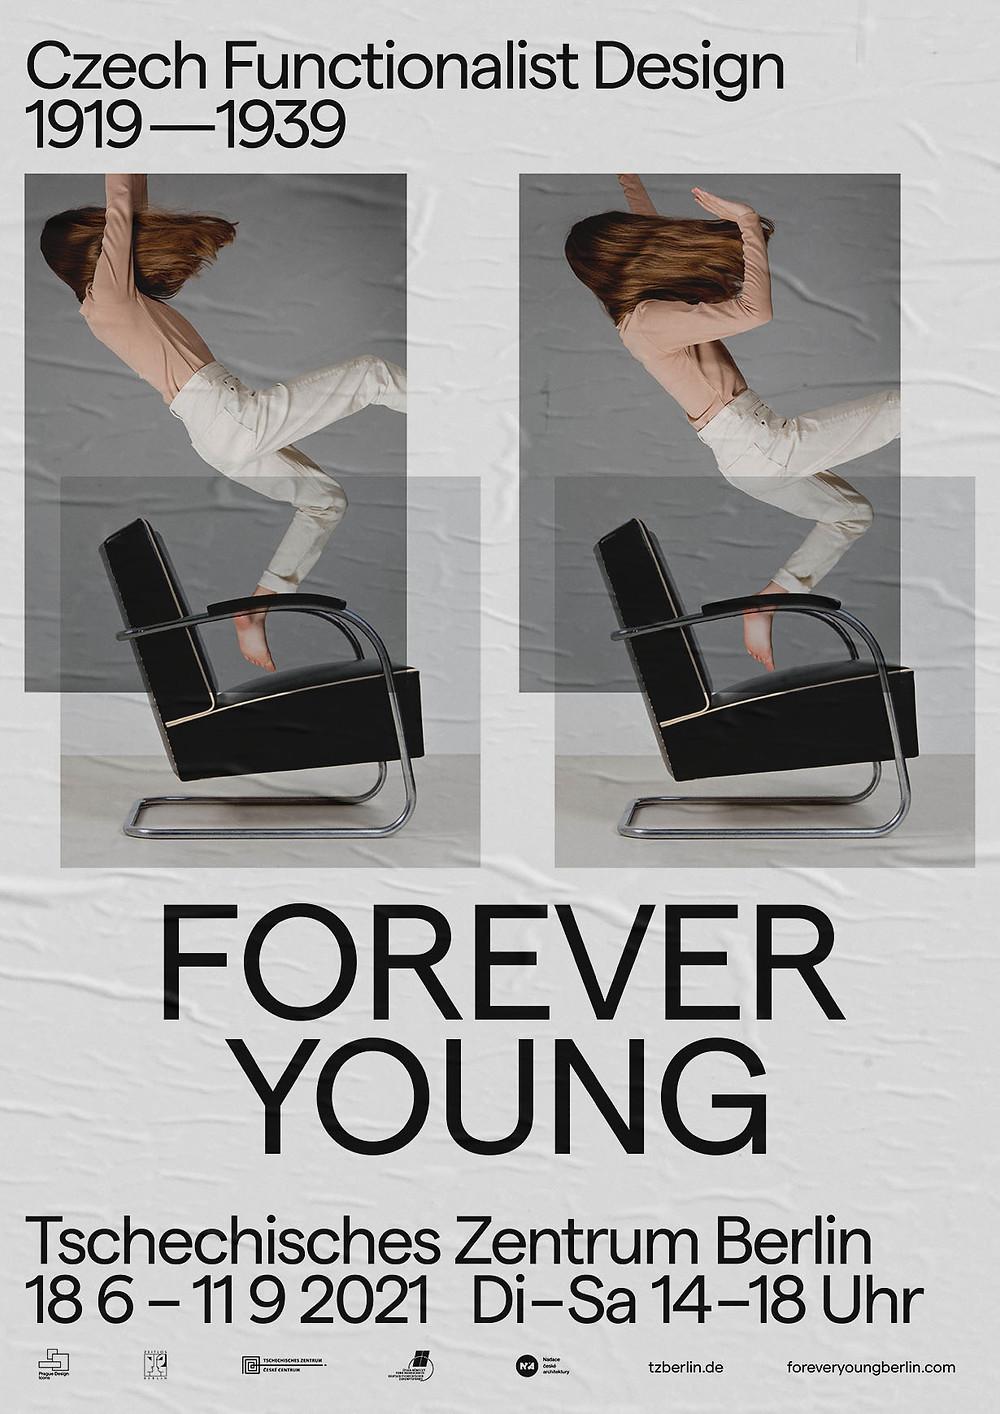 FOREVER YOUNG | Tschechisches Zentrum Berlin